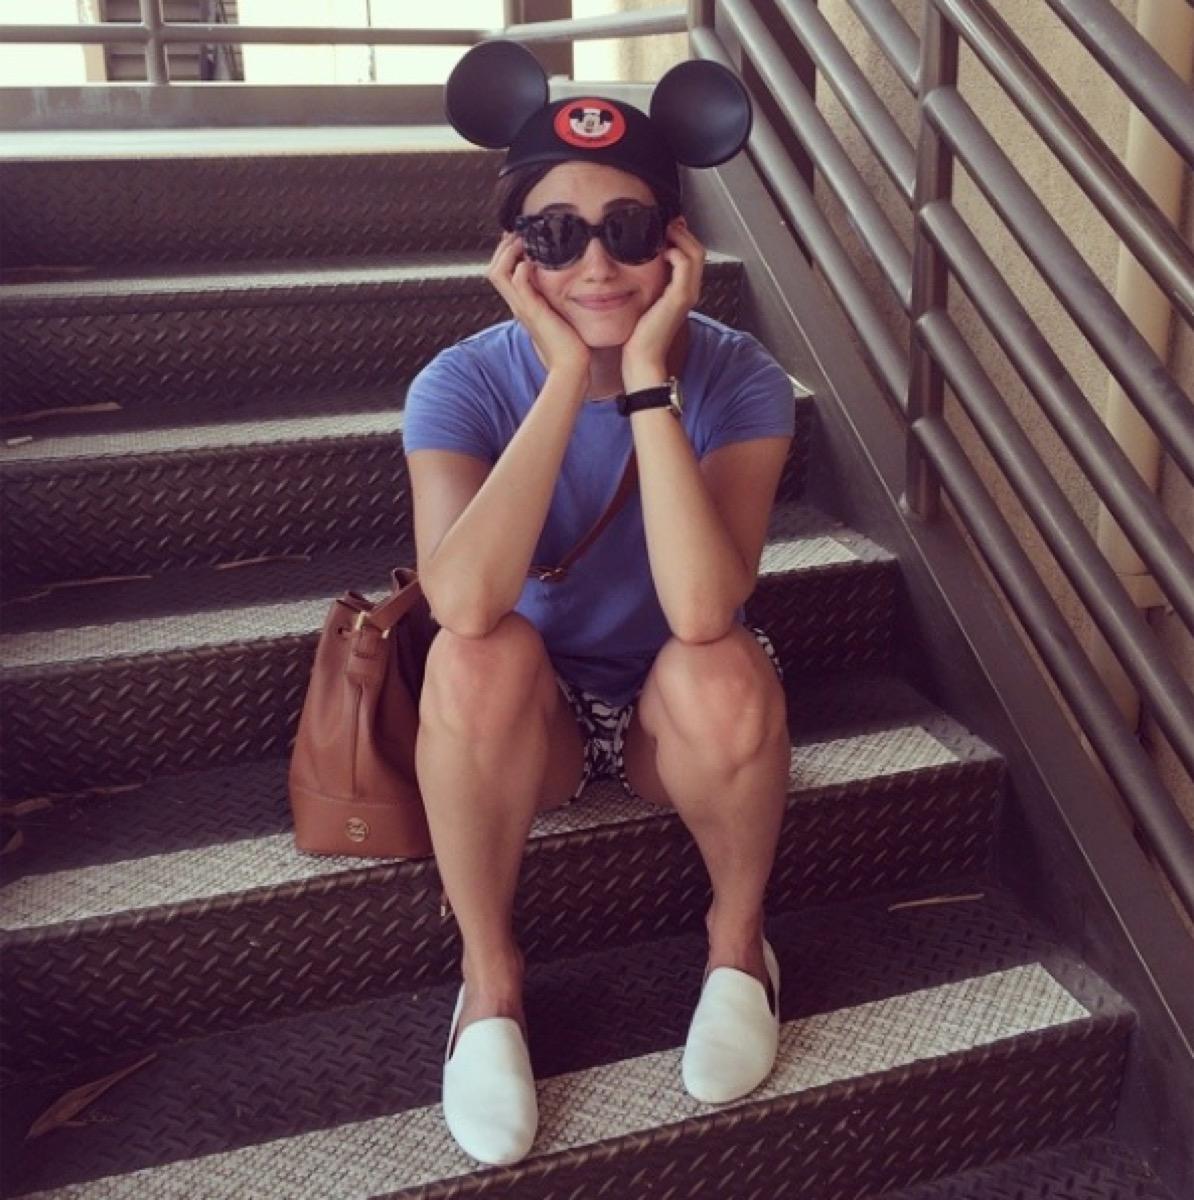 emmy rossum sitting on stairs wearing disney hat